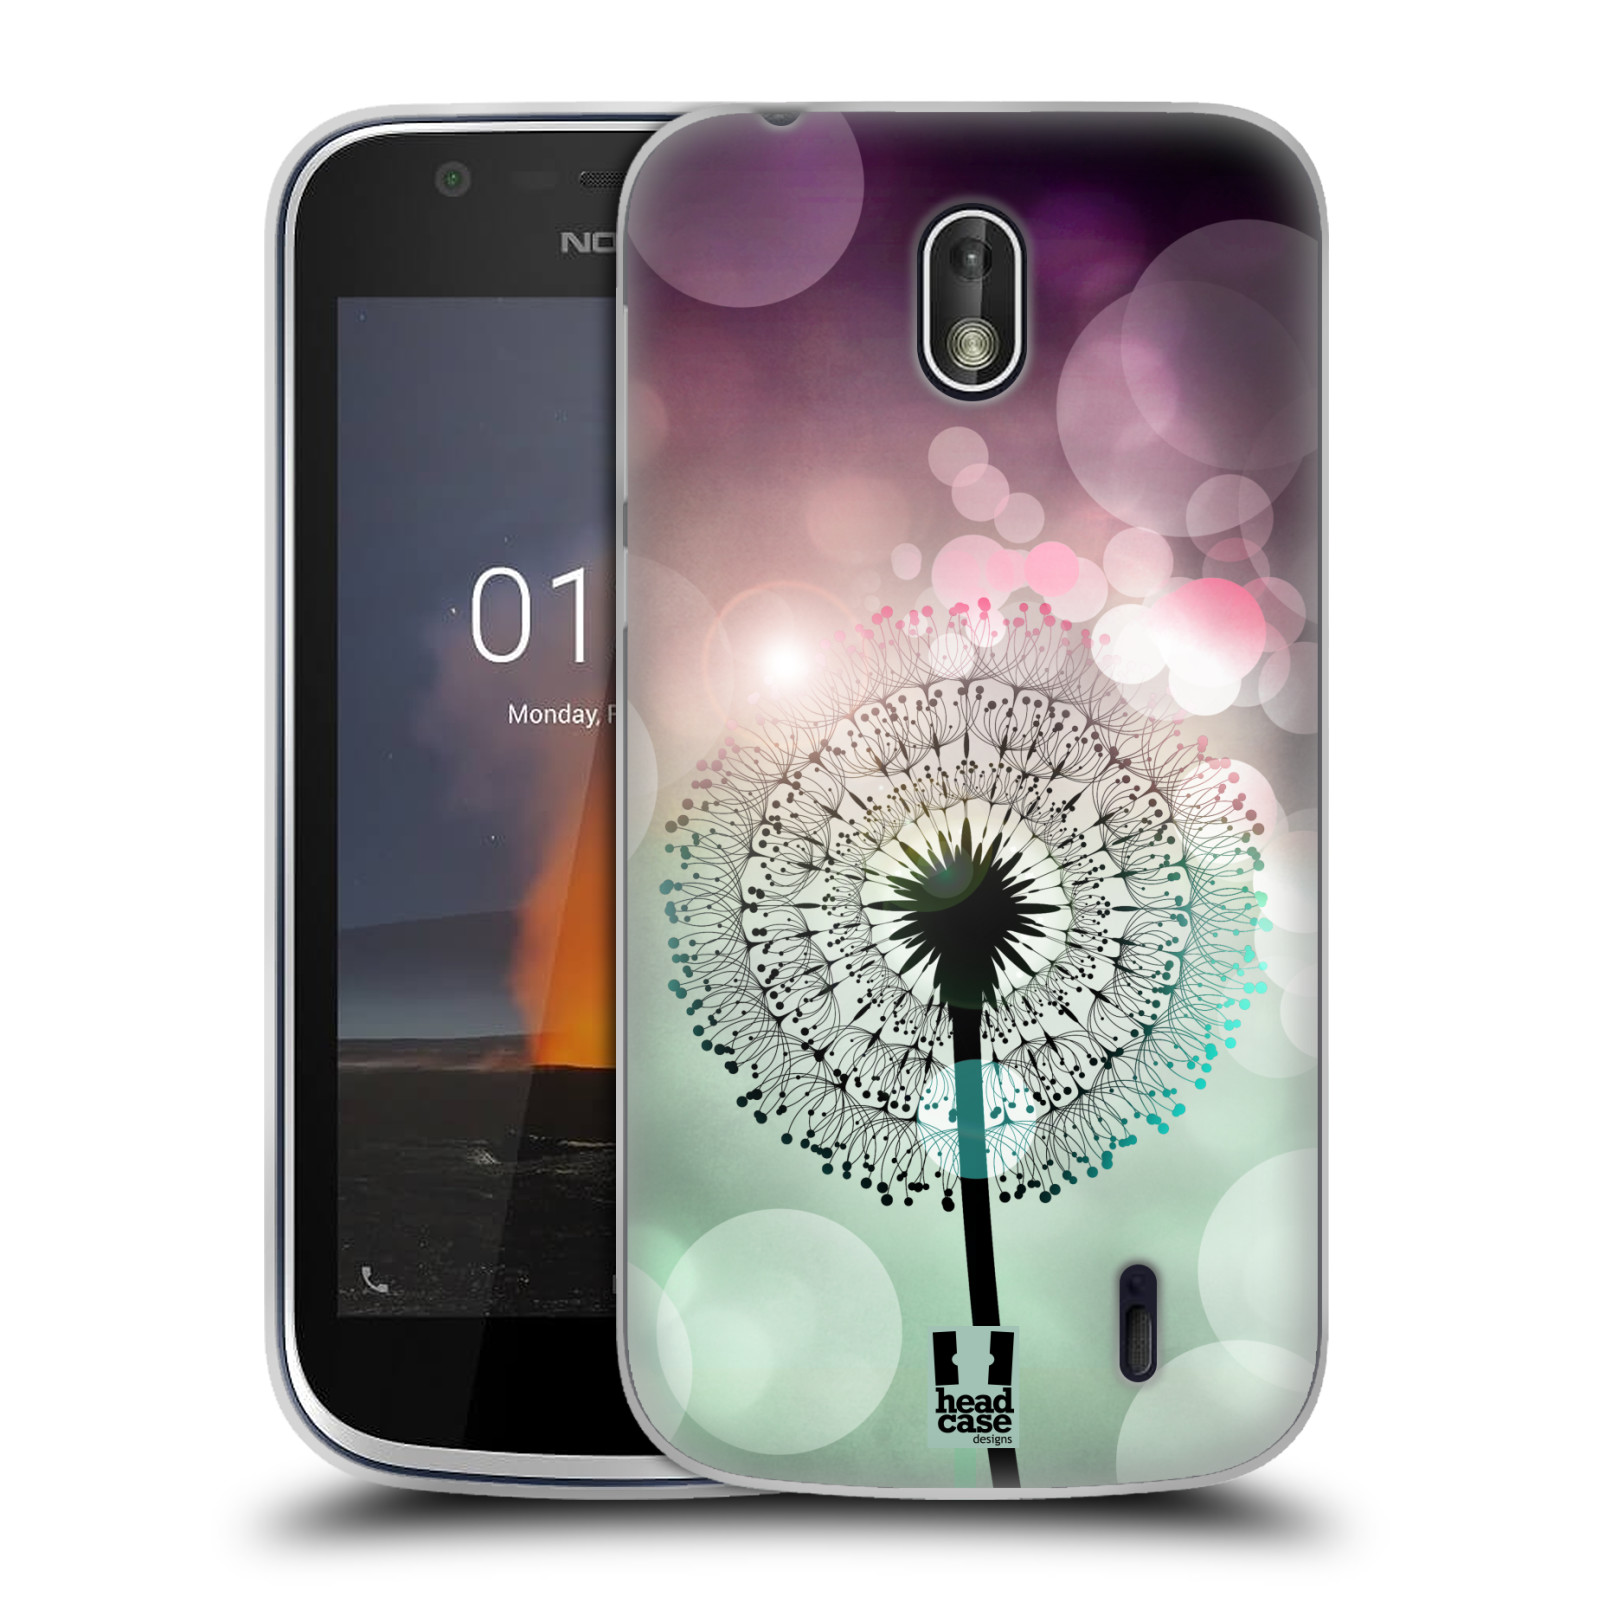 Silikonové pouzdro na mobil Nokia 1 - Head Case - Pampeliškové odlesky